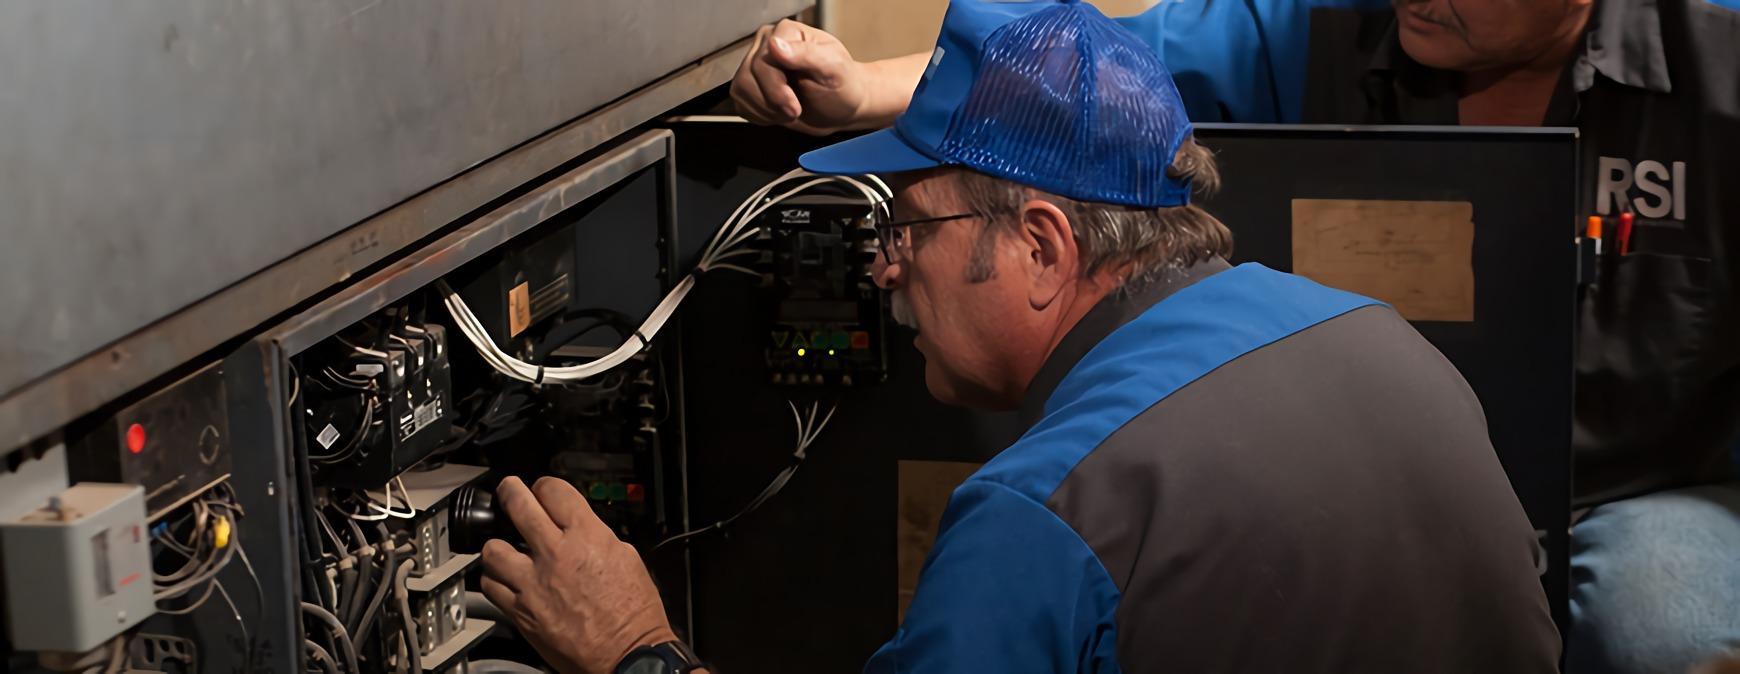 hvac specialist working on coolant